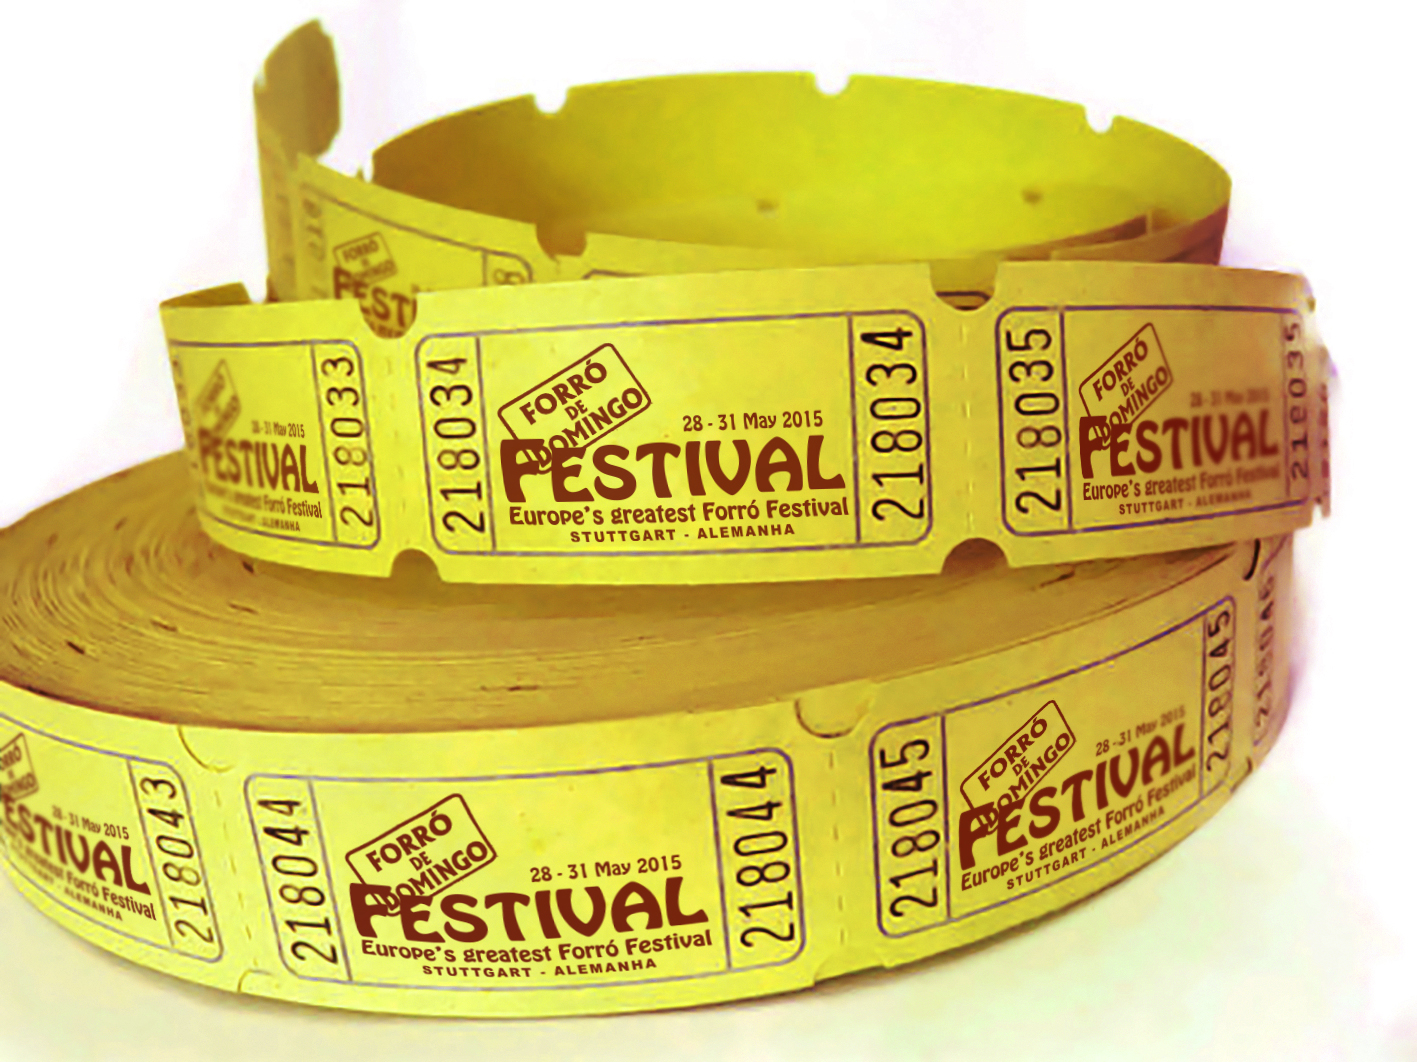 http://forrofestival.com/wp-content/uploads/2015/02/FdD-ticket_2-dias.jpg